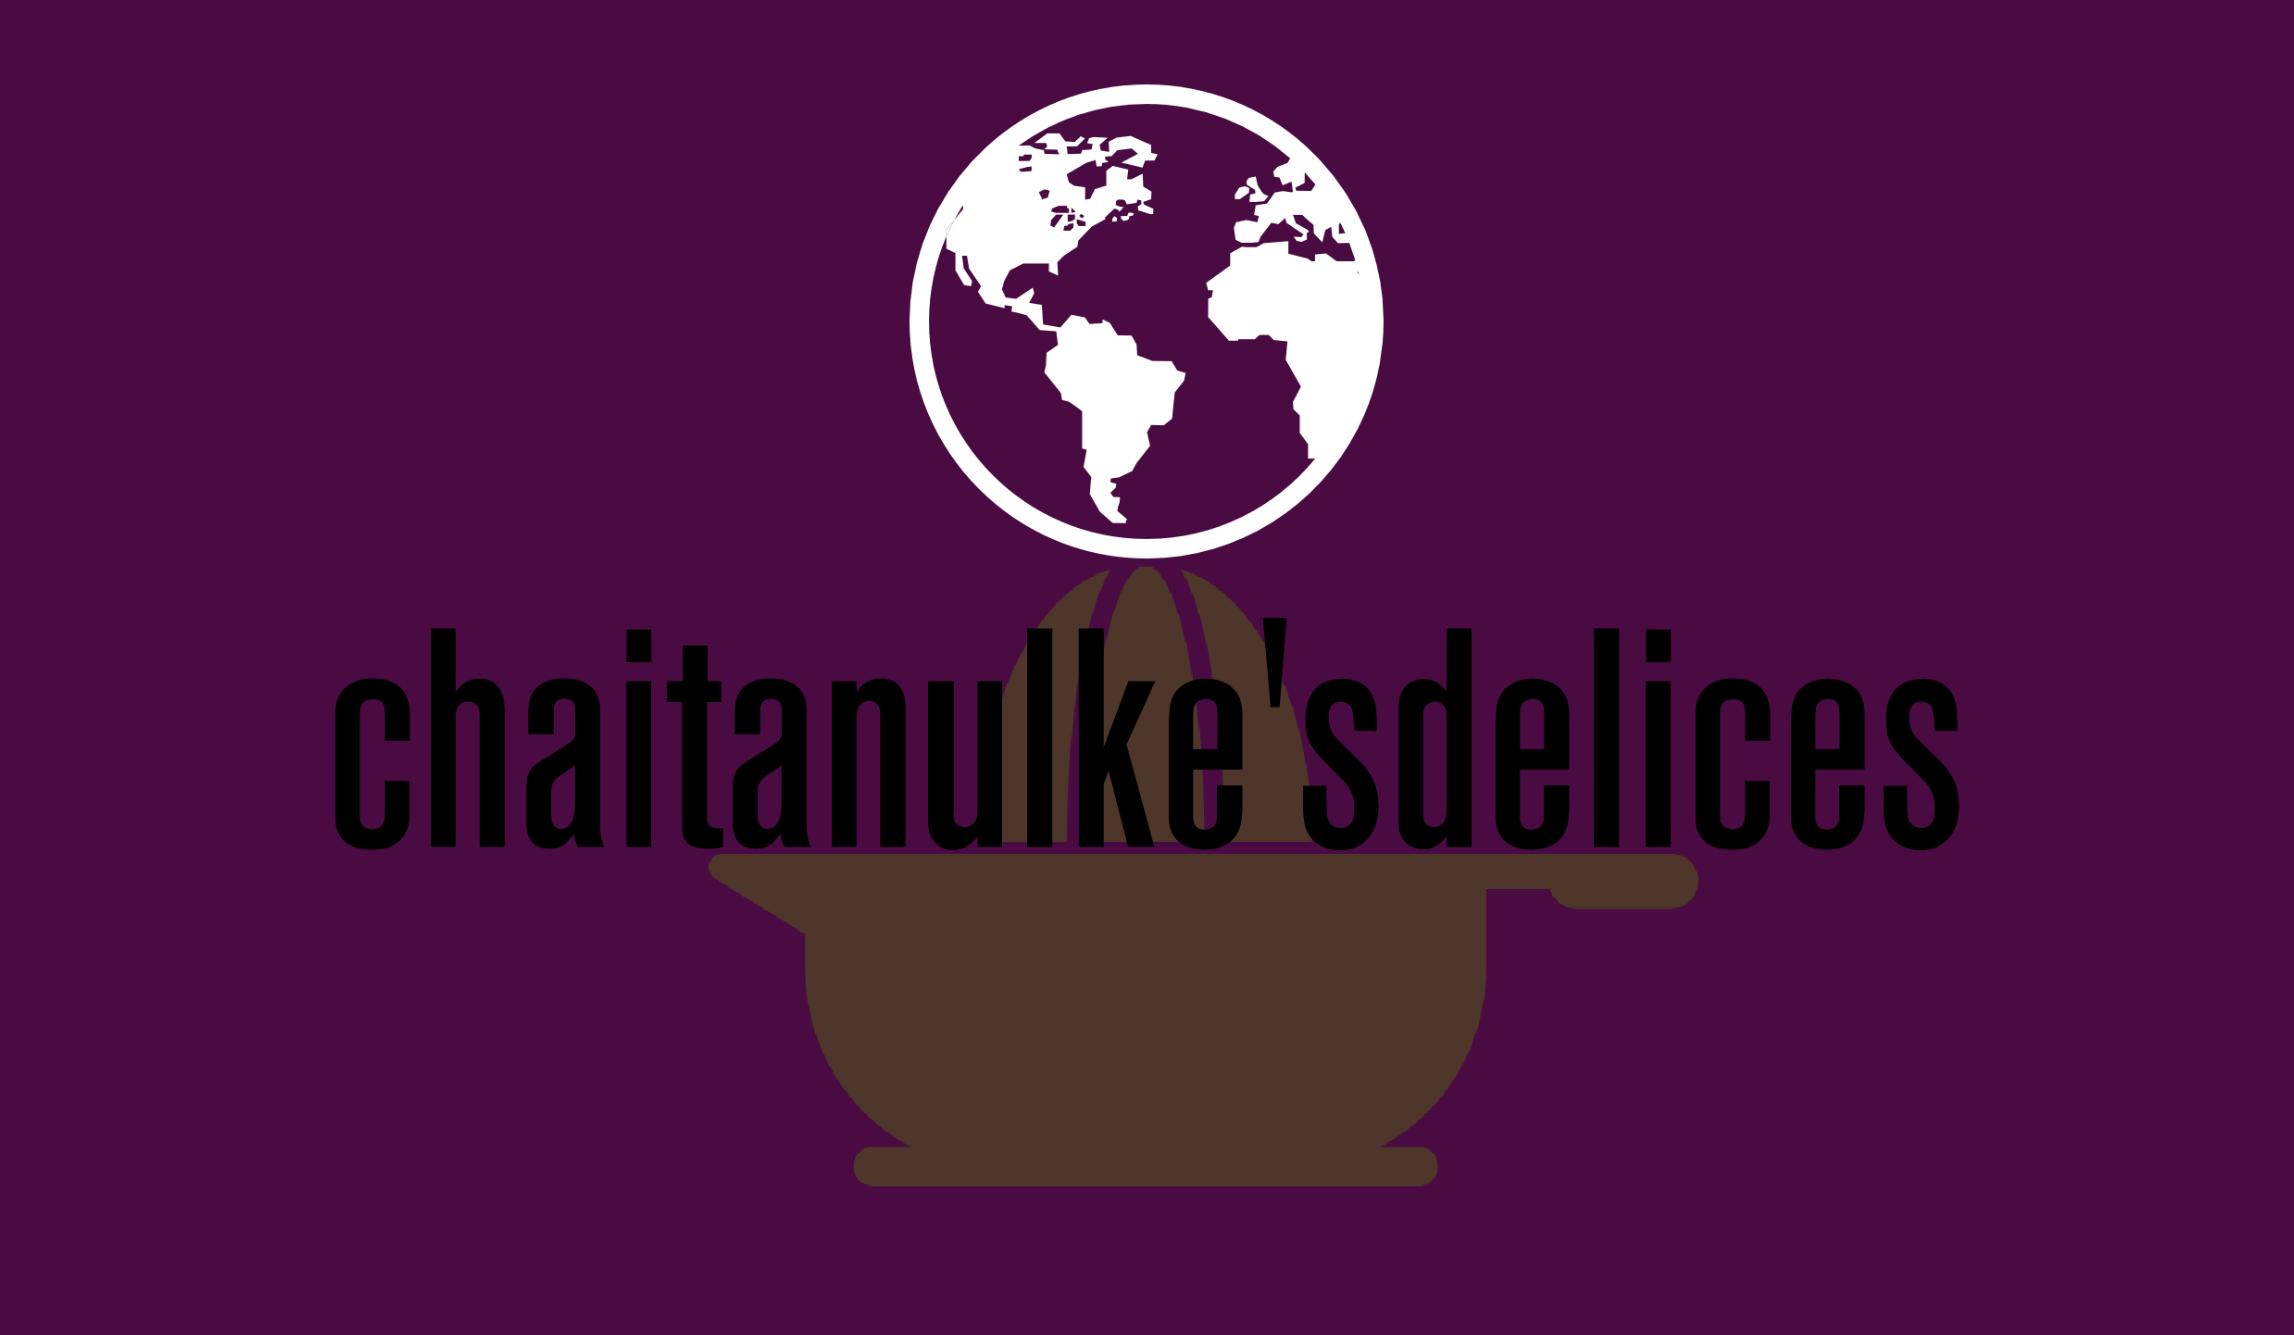 Chaitanulke's delices